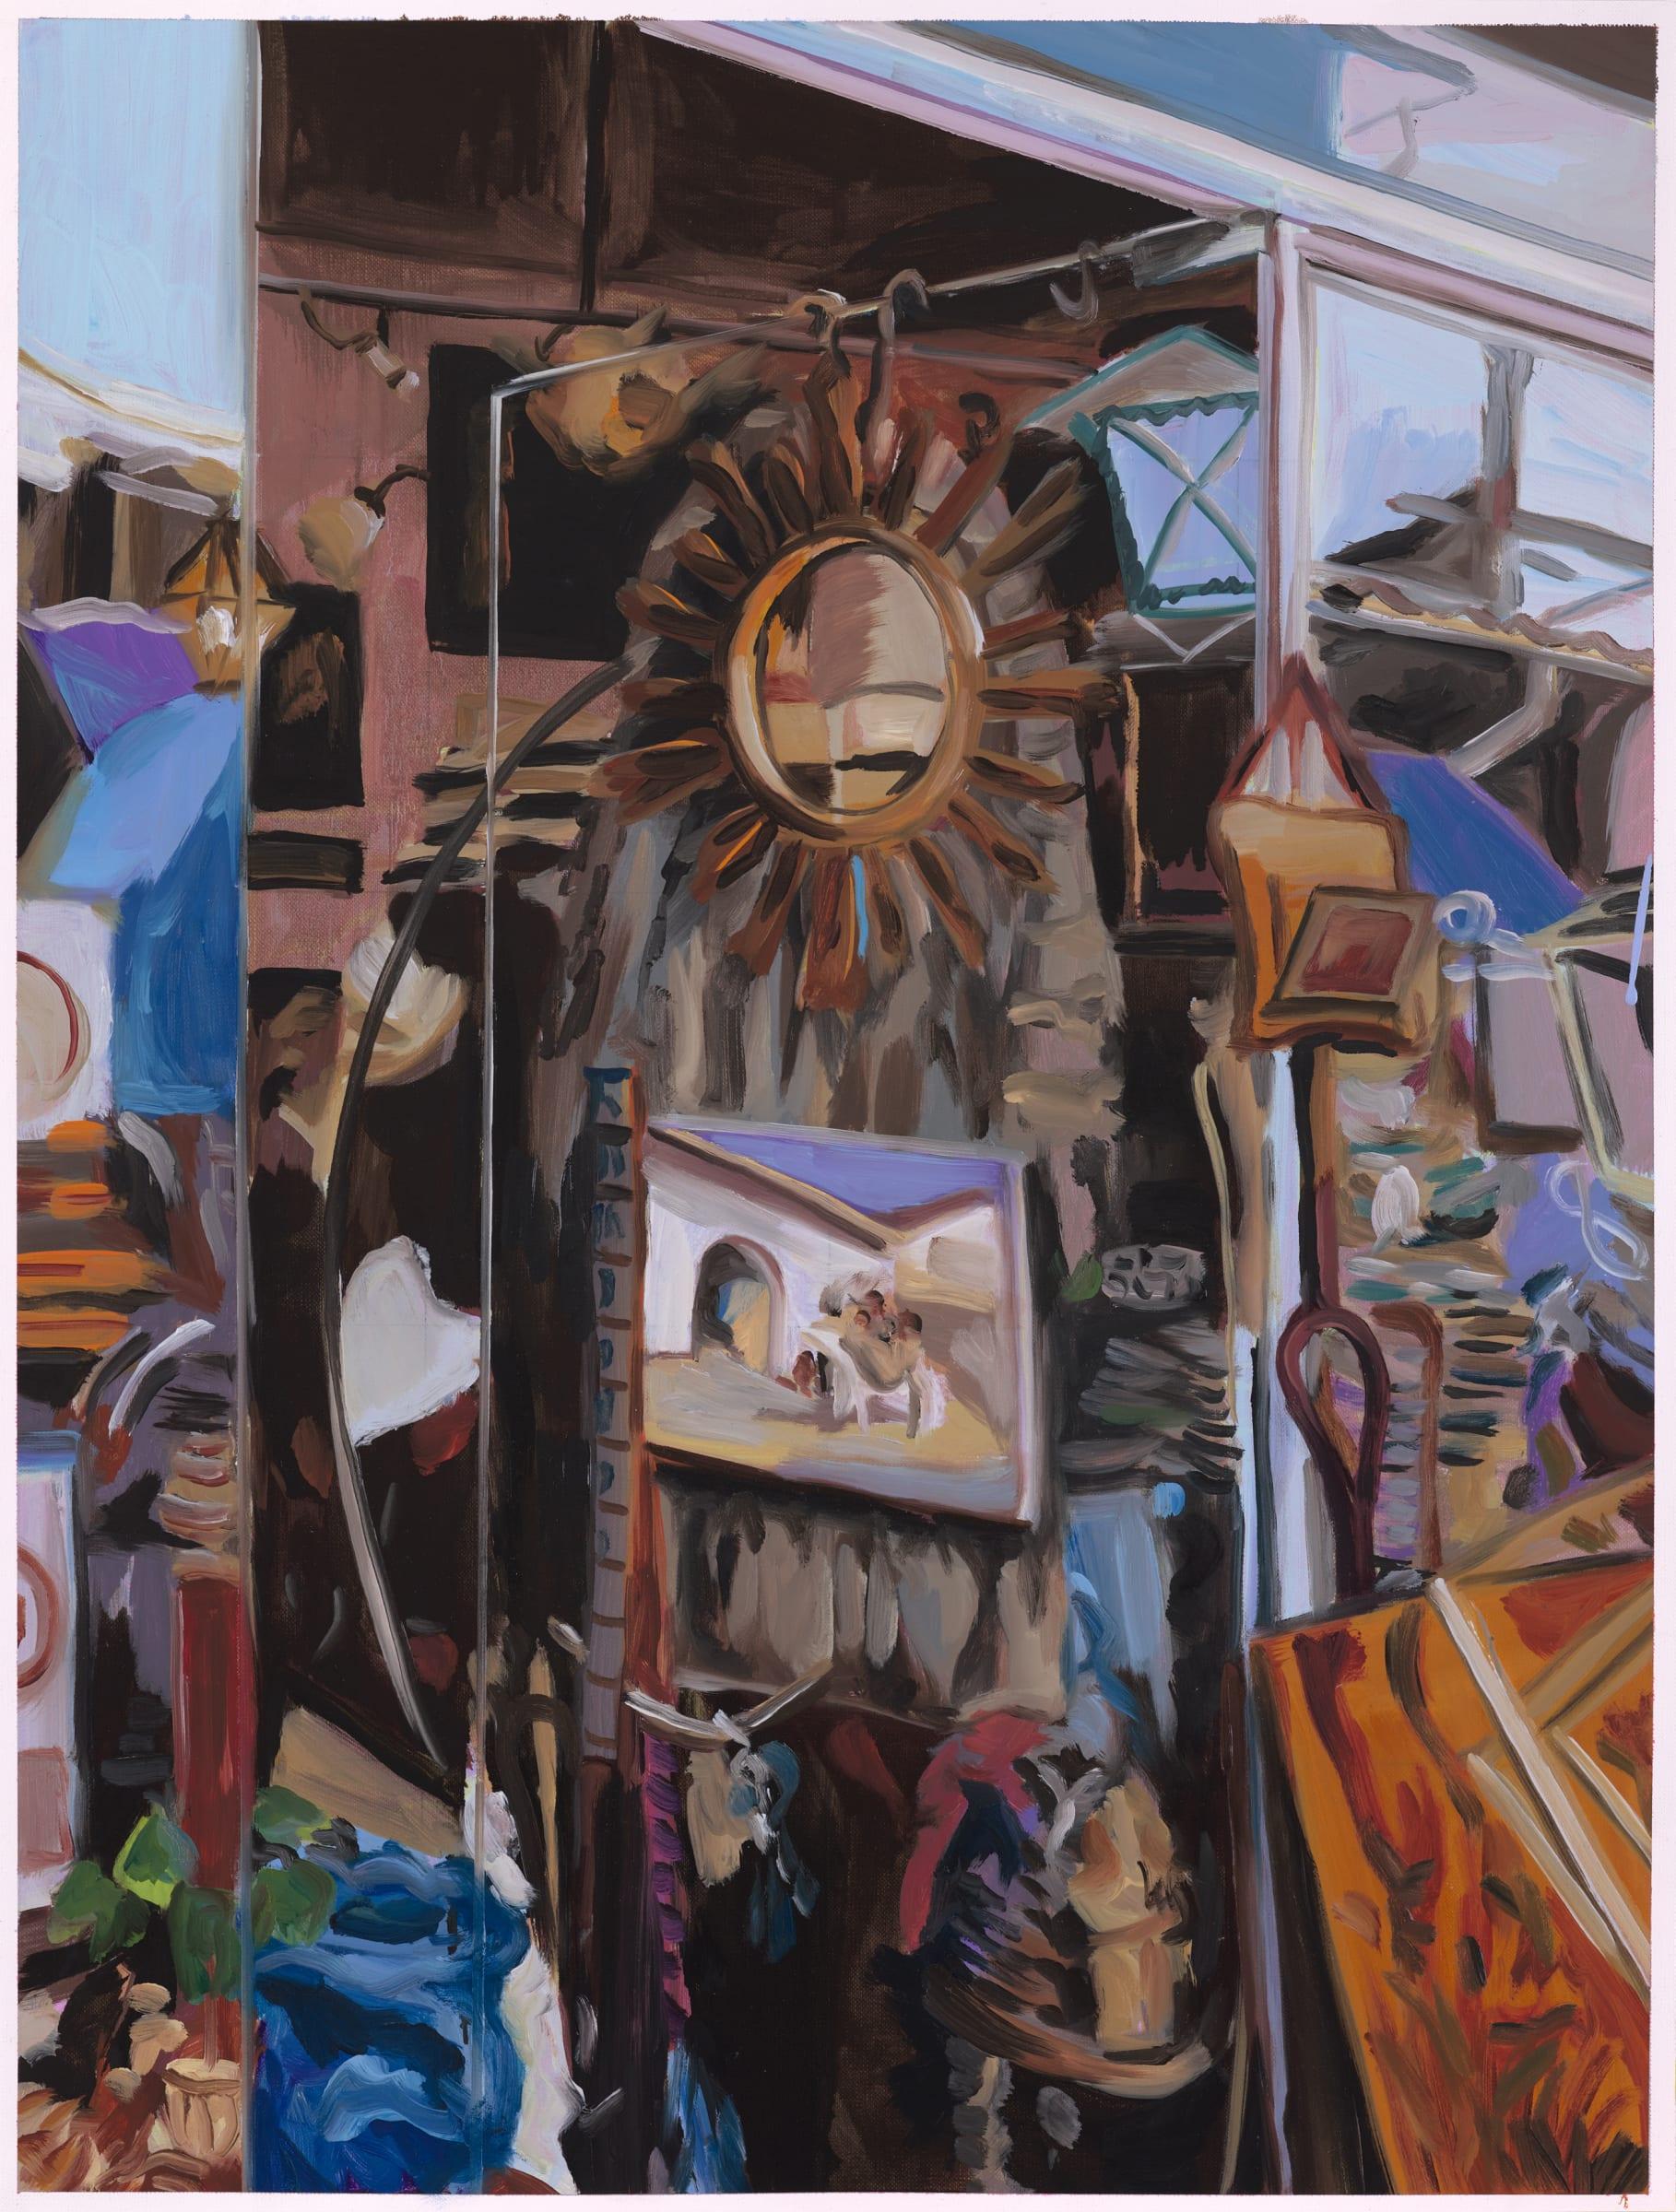 "<span class=""link fancybox-details-link""><a href=""/exhibitions/33/works/artworks1686/"">View Detail Page</a></span><div class=""artist""><strong>Anna Freeman Bentley</strong></div><div class=""title""><em>Study for Rebuilding</em>, 2021</div><div class=""medium"">Oil on paper</div><div class=""dimensions"">63 x 44 cm<br>24 3/4 x 17 3/8 in</div>"